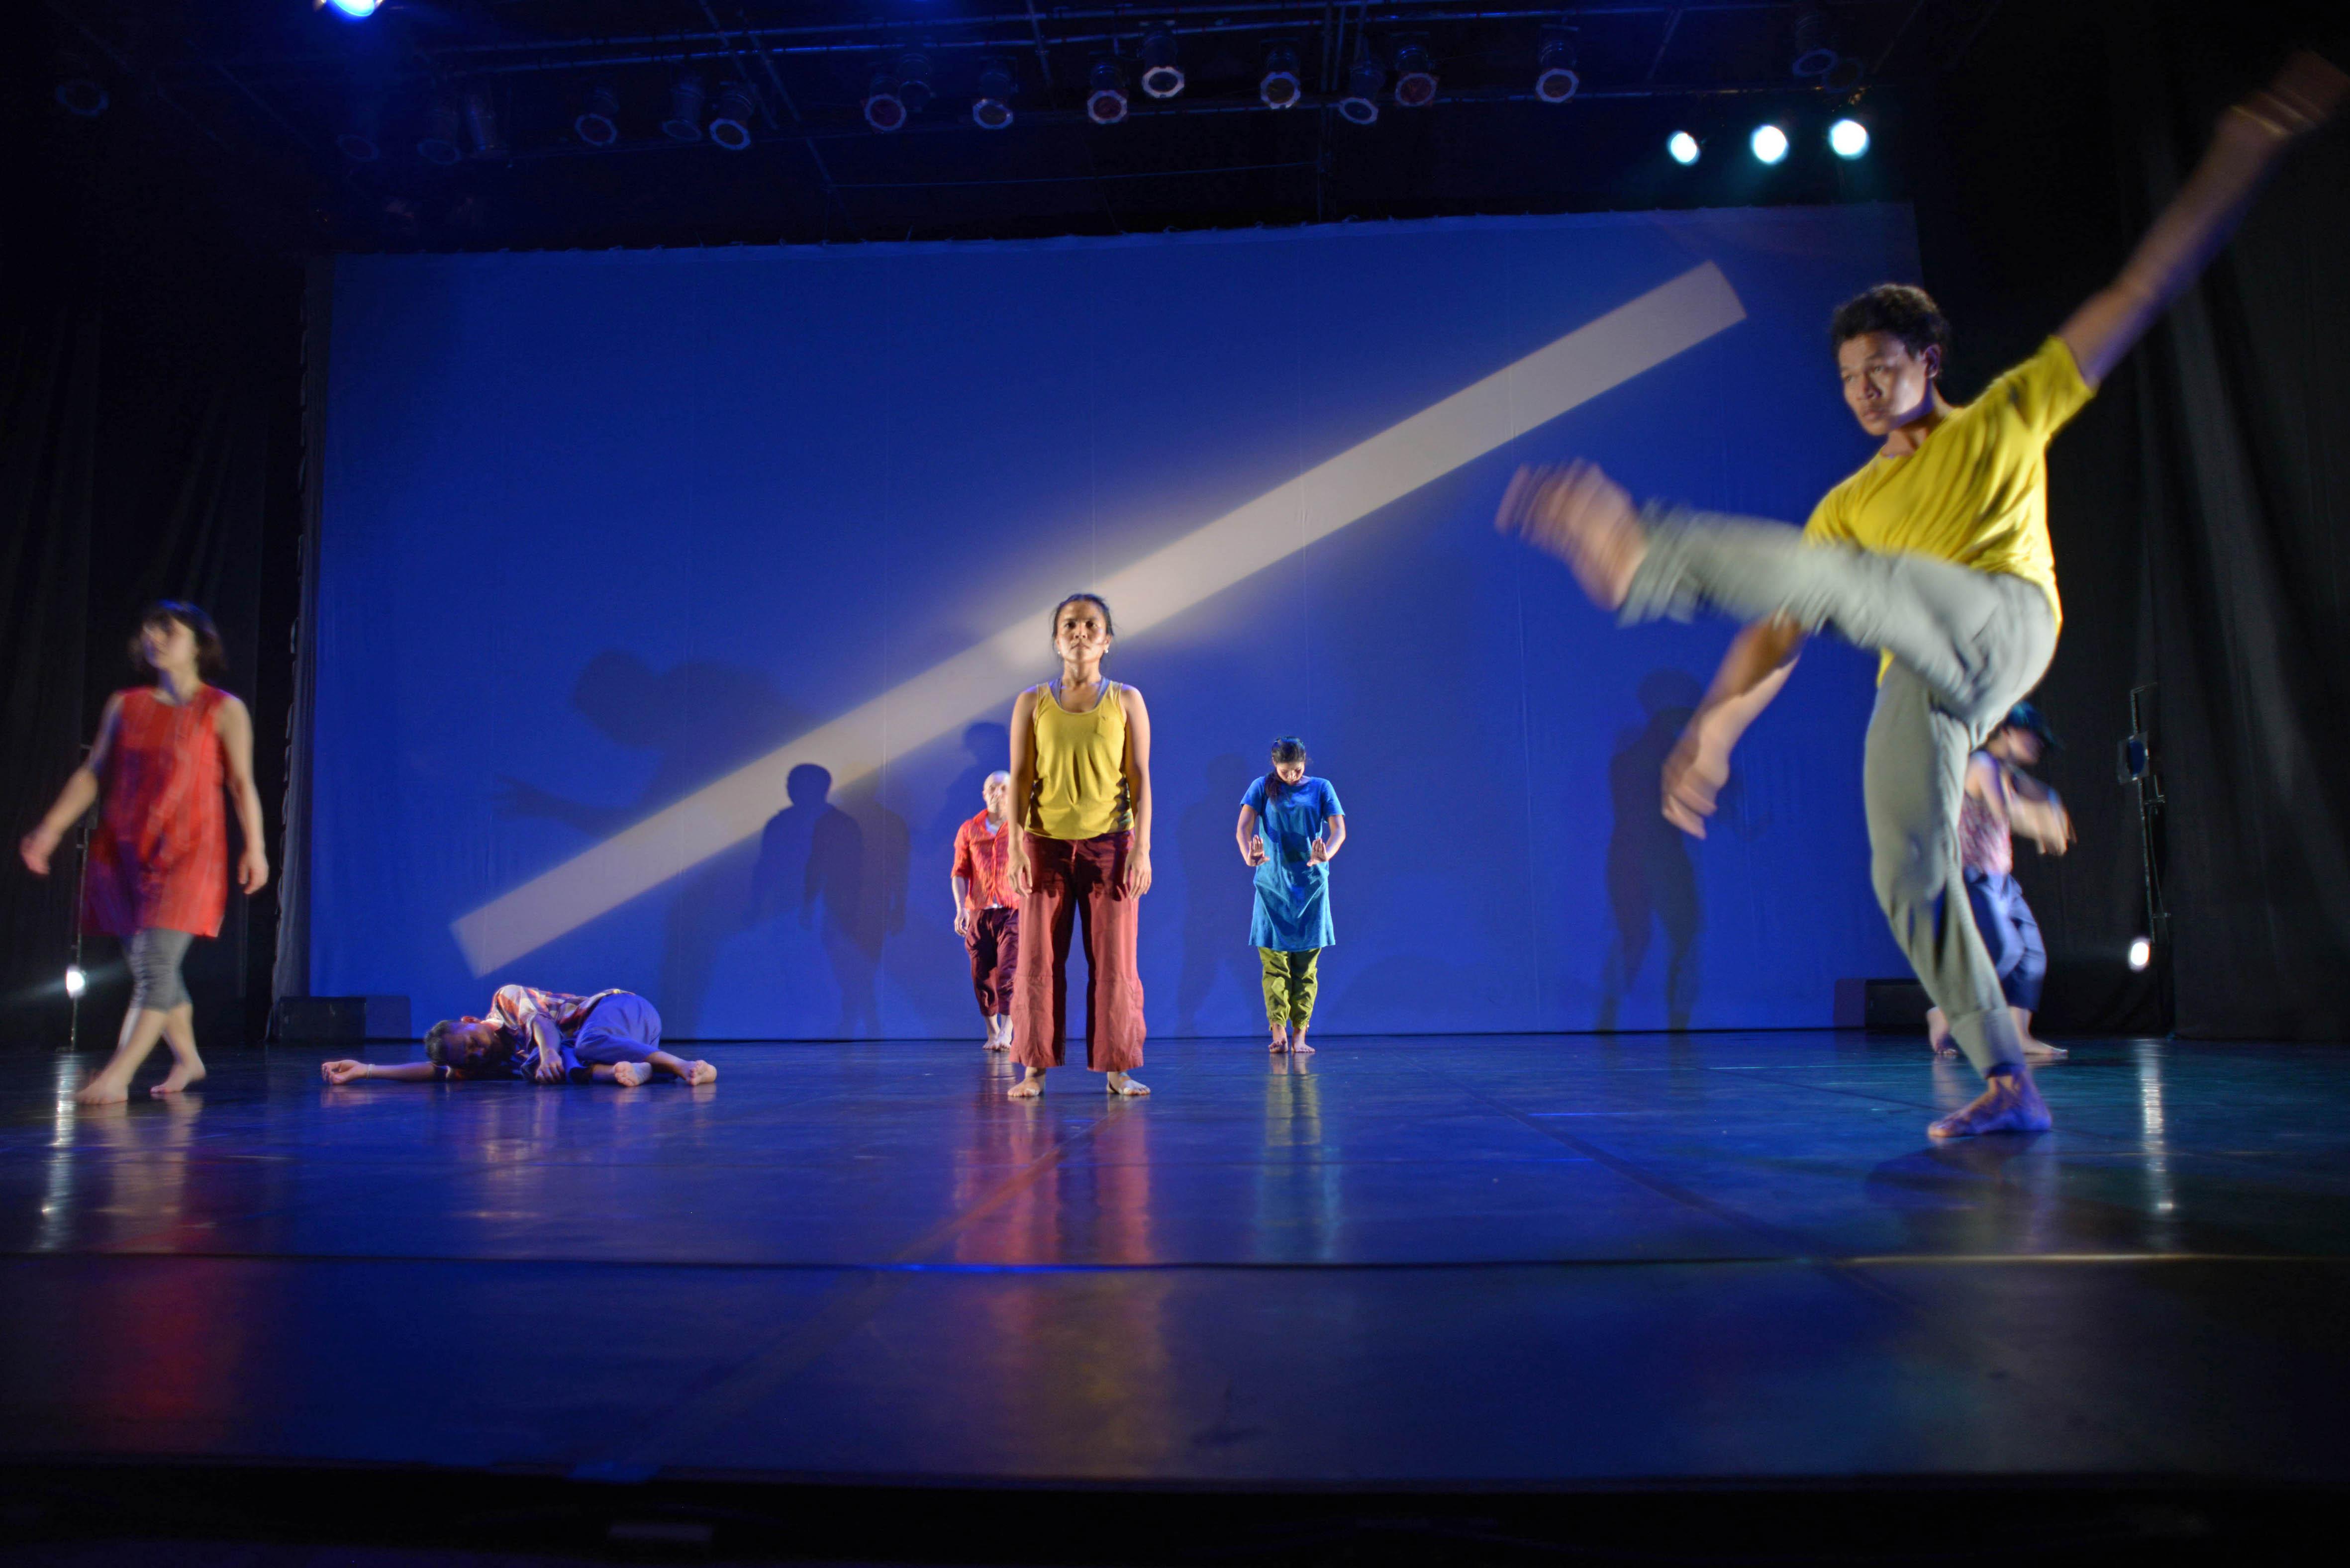 『RE/PLAY Dance Edit』プノンペン公演 Photo by Kong Vollak